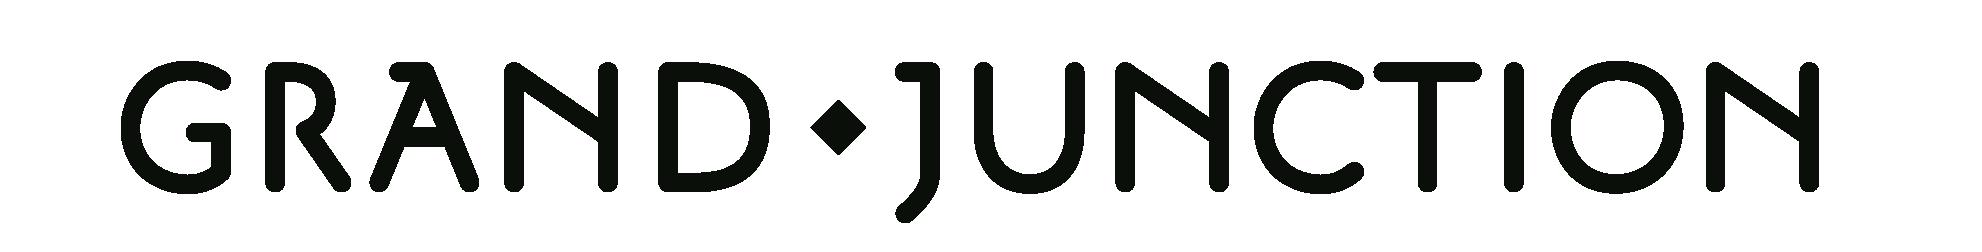 logo-black-trans_logo-black.png